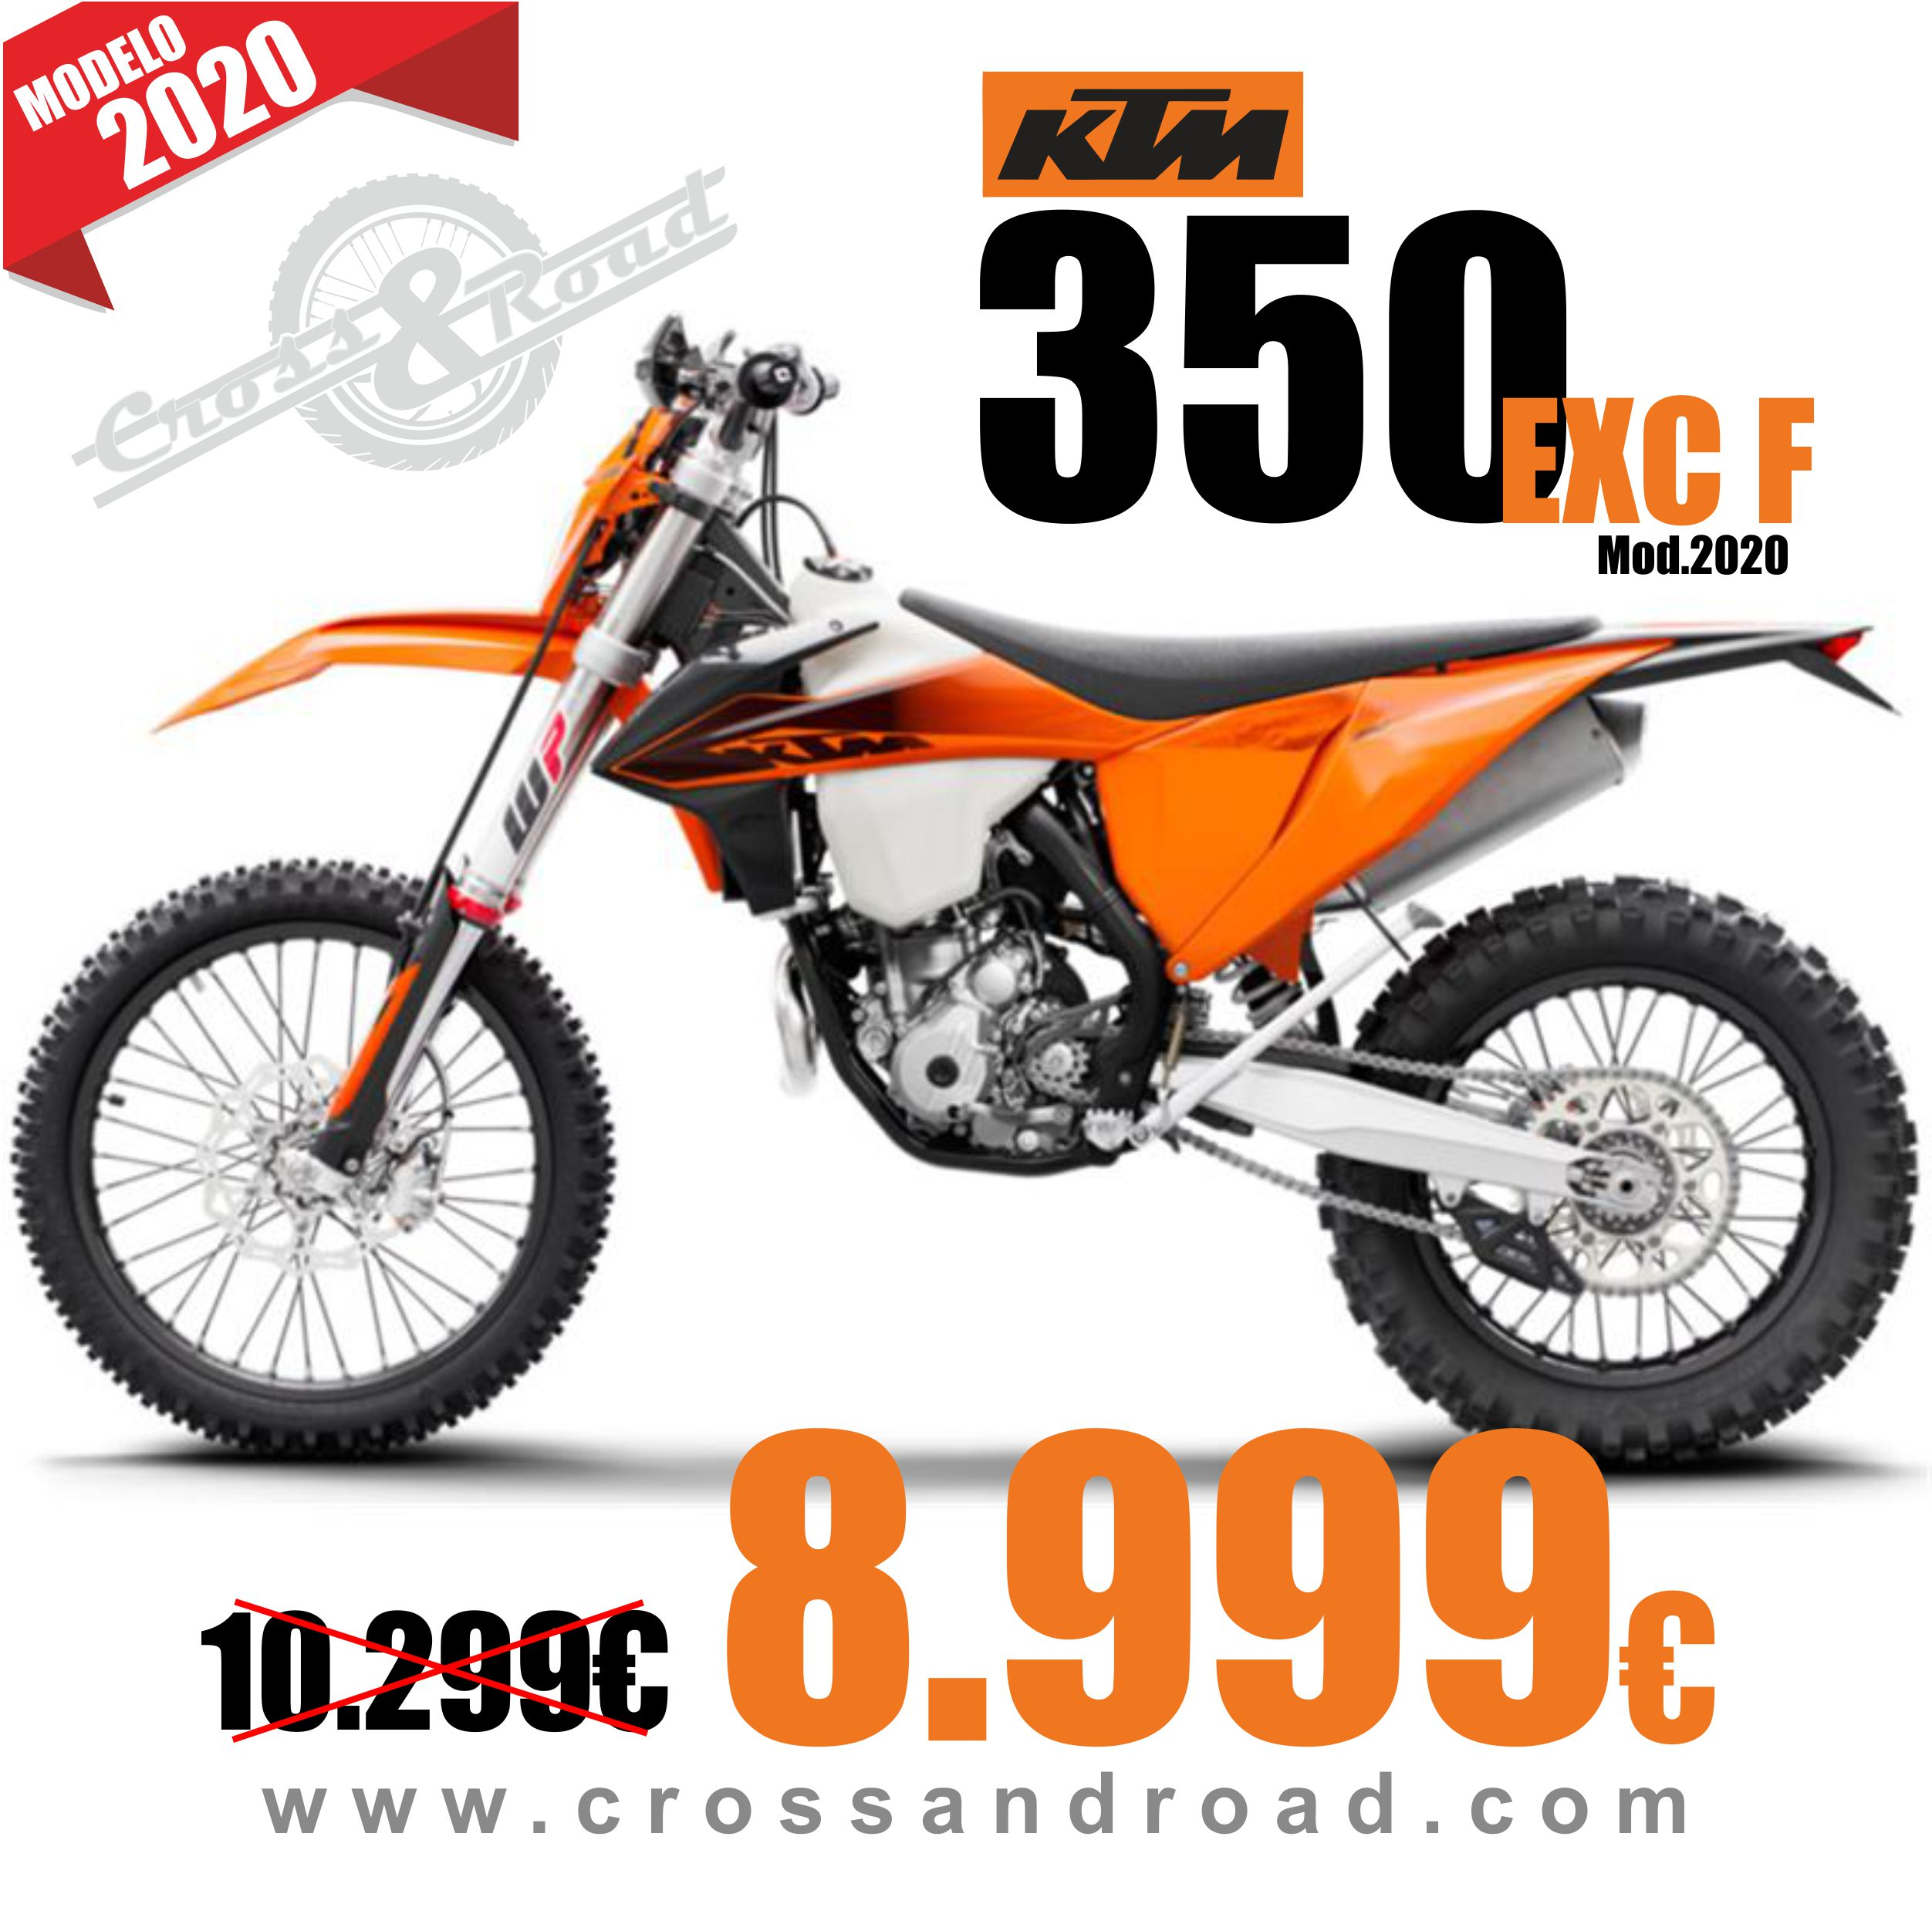 KTM 350 EXC F Mod 2020